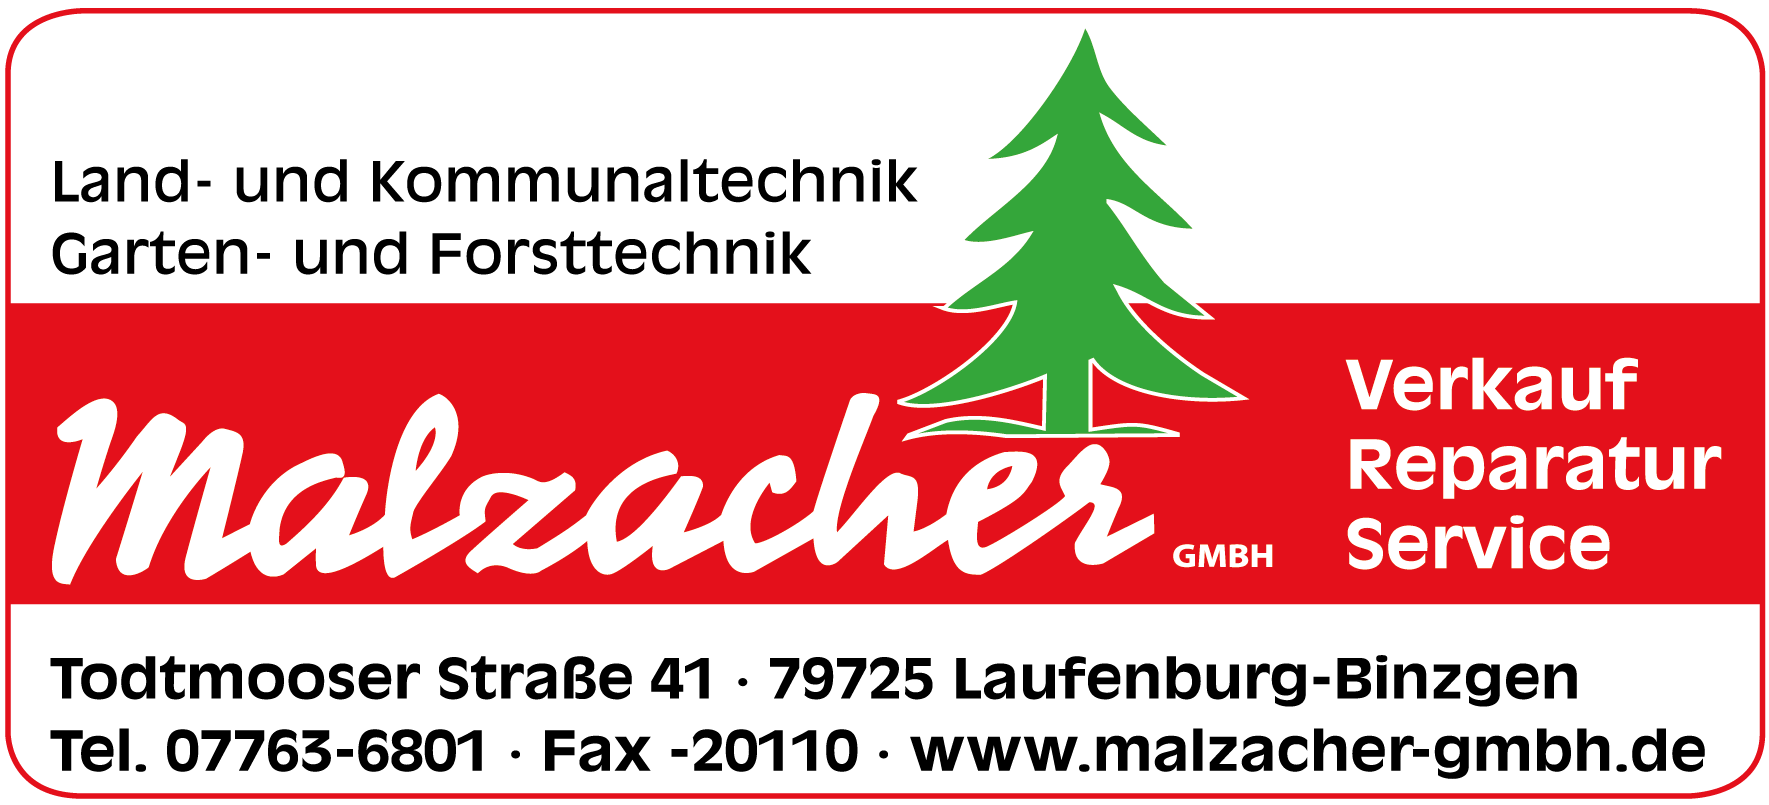 Malzacher GmbH